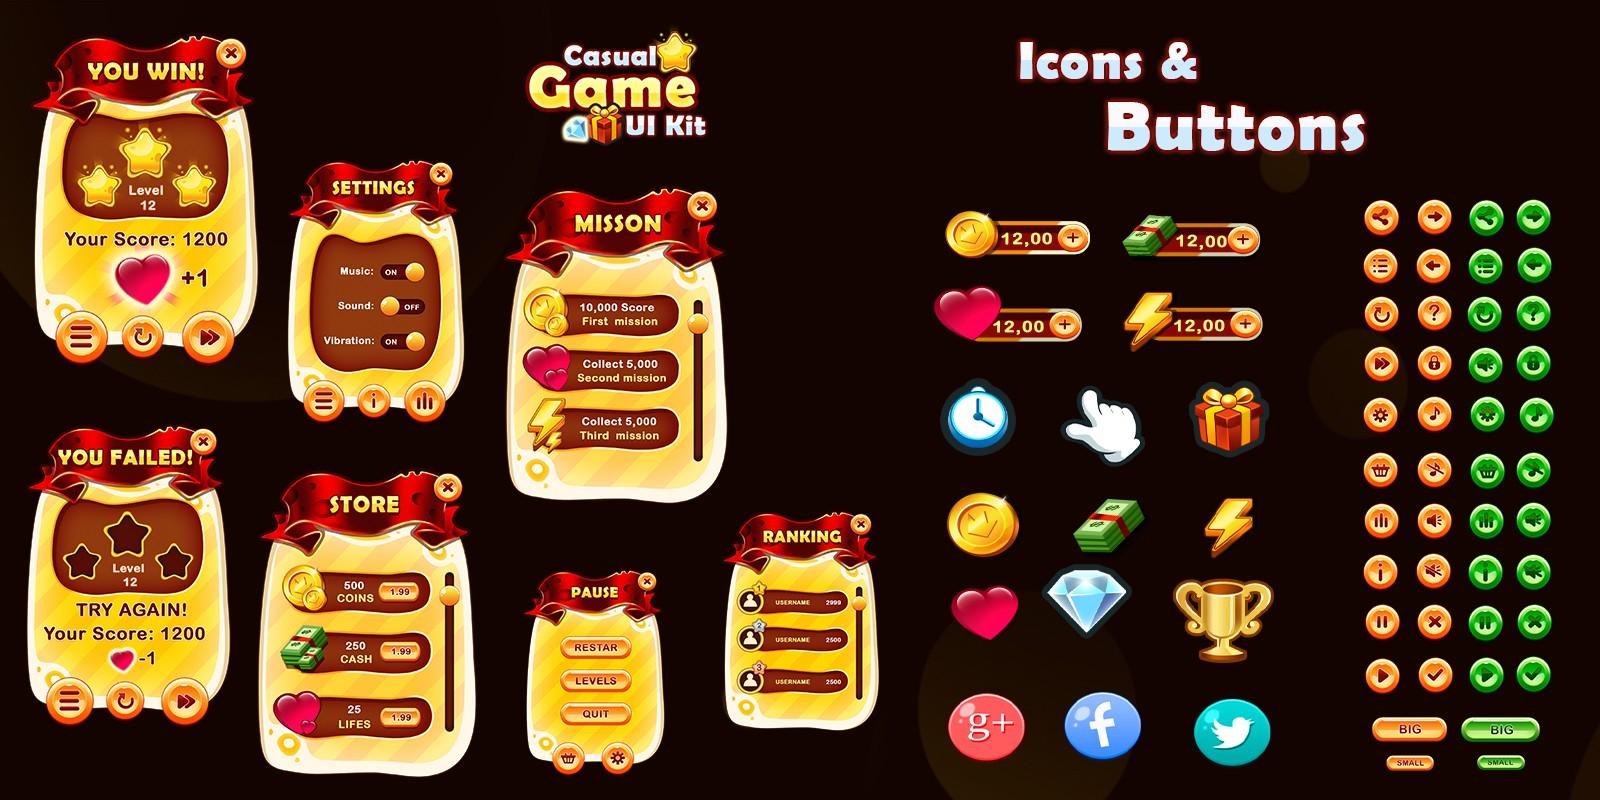 Casual Game UI kit